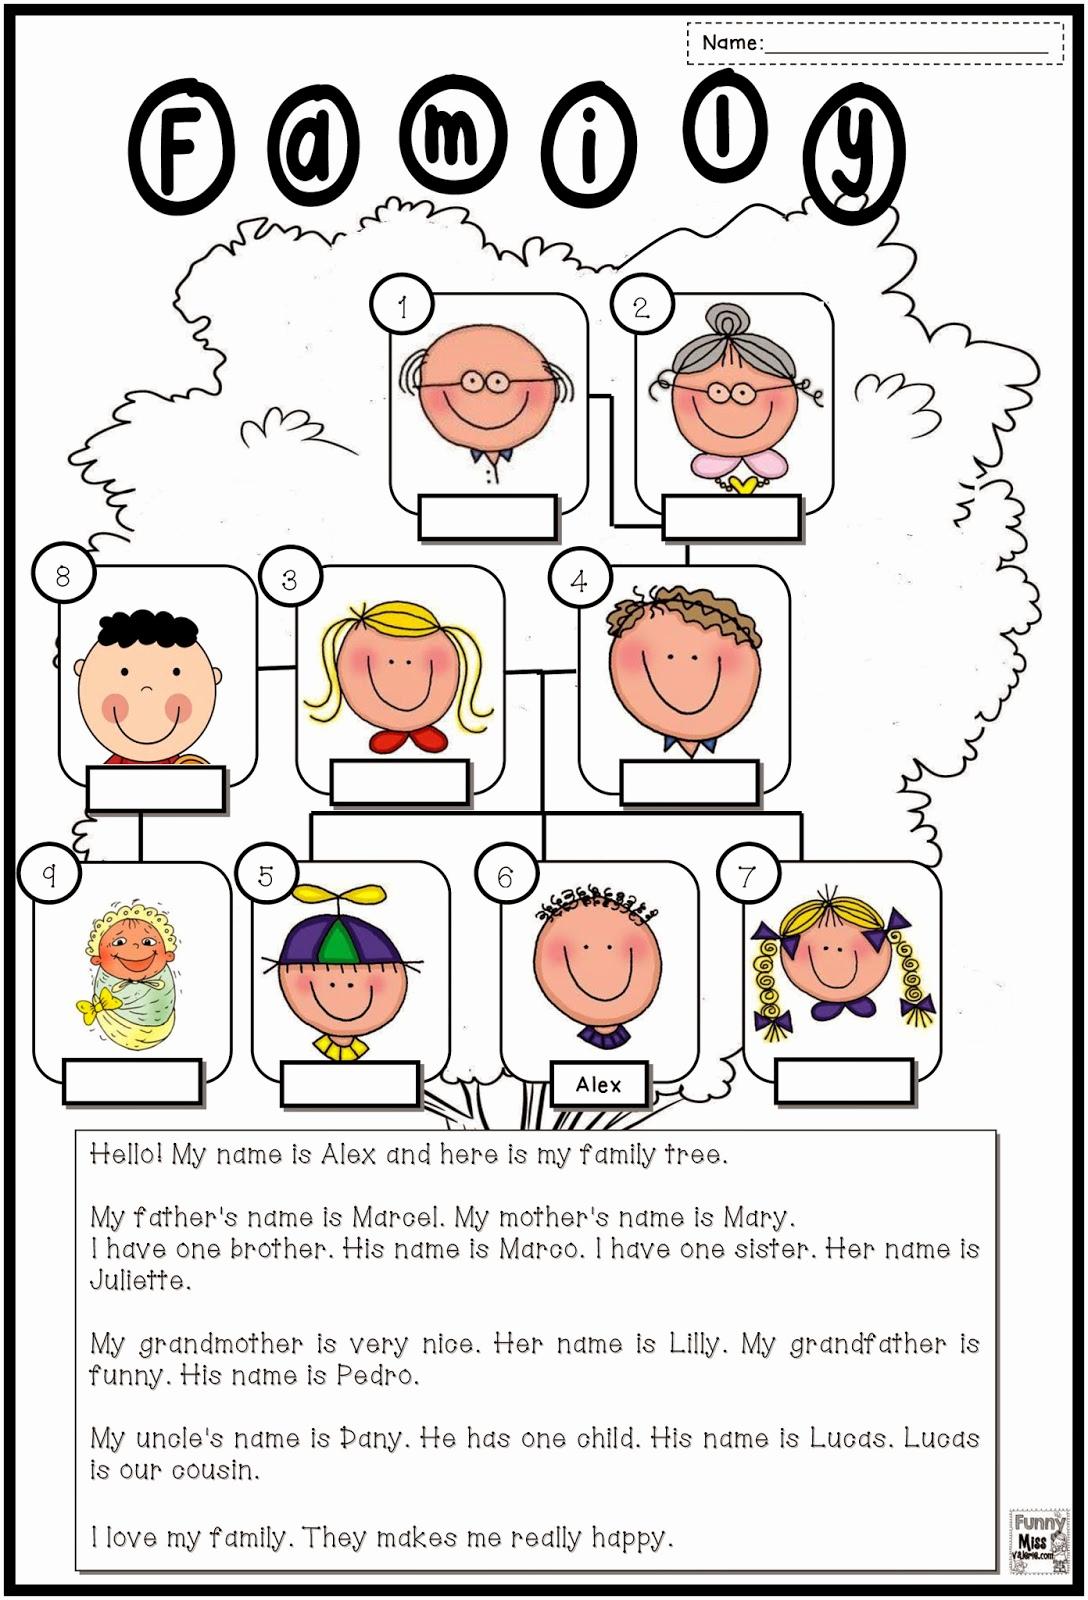 Family Tree Worksheets for Kids Inspirational New 266 Family Tree Worksheet for Grade 2